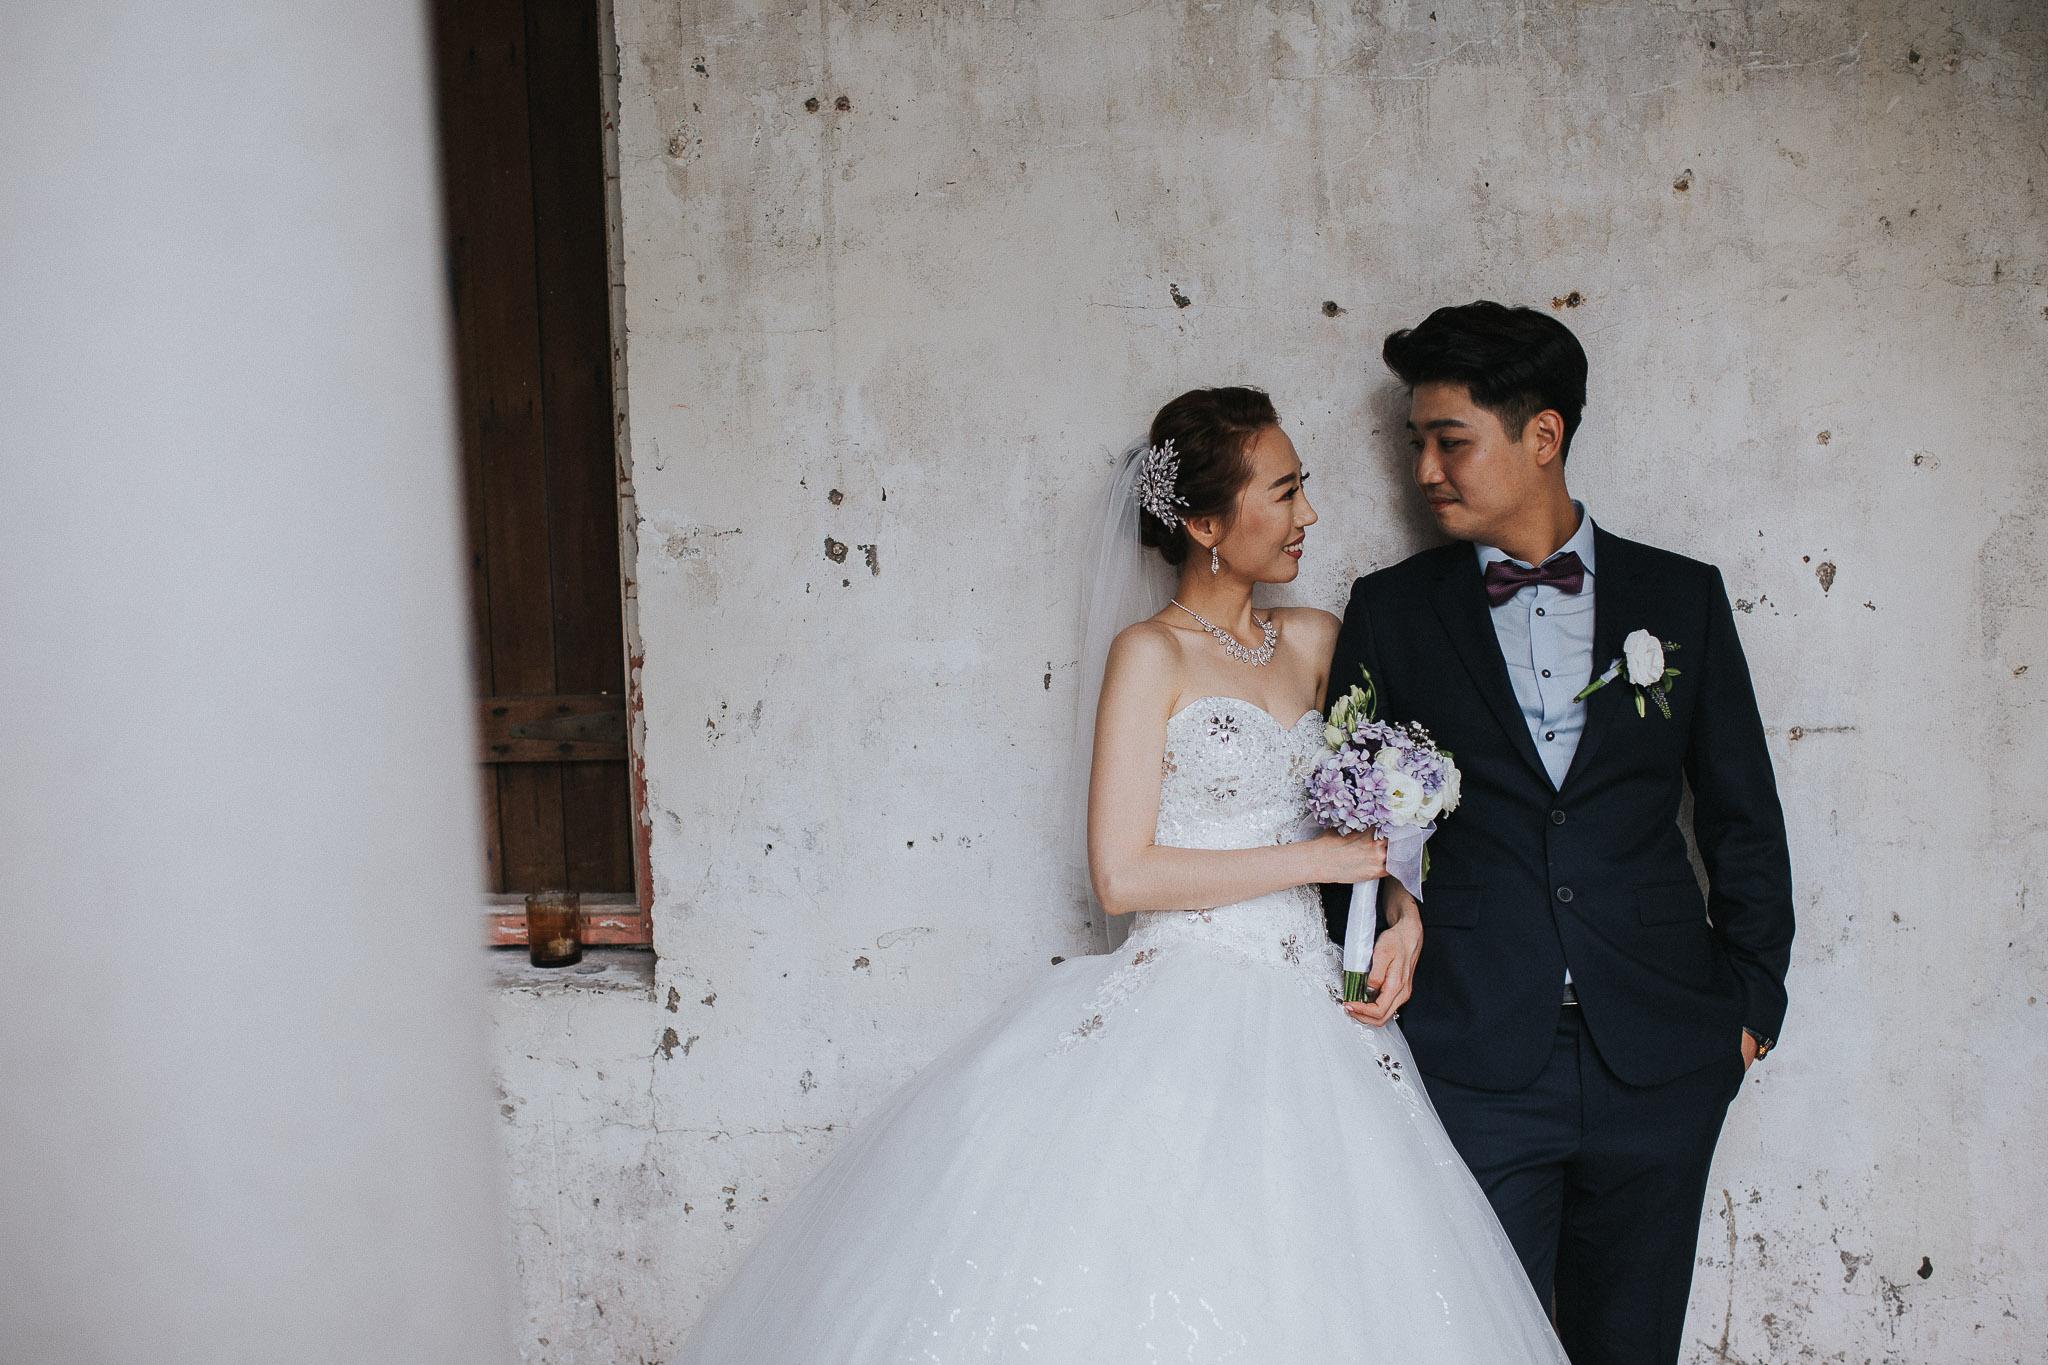 Mantells Auckland wedding photographer - Eri-Jun-106.jpg